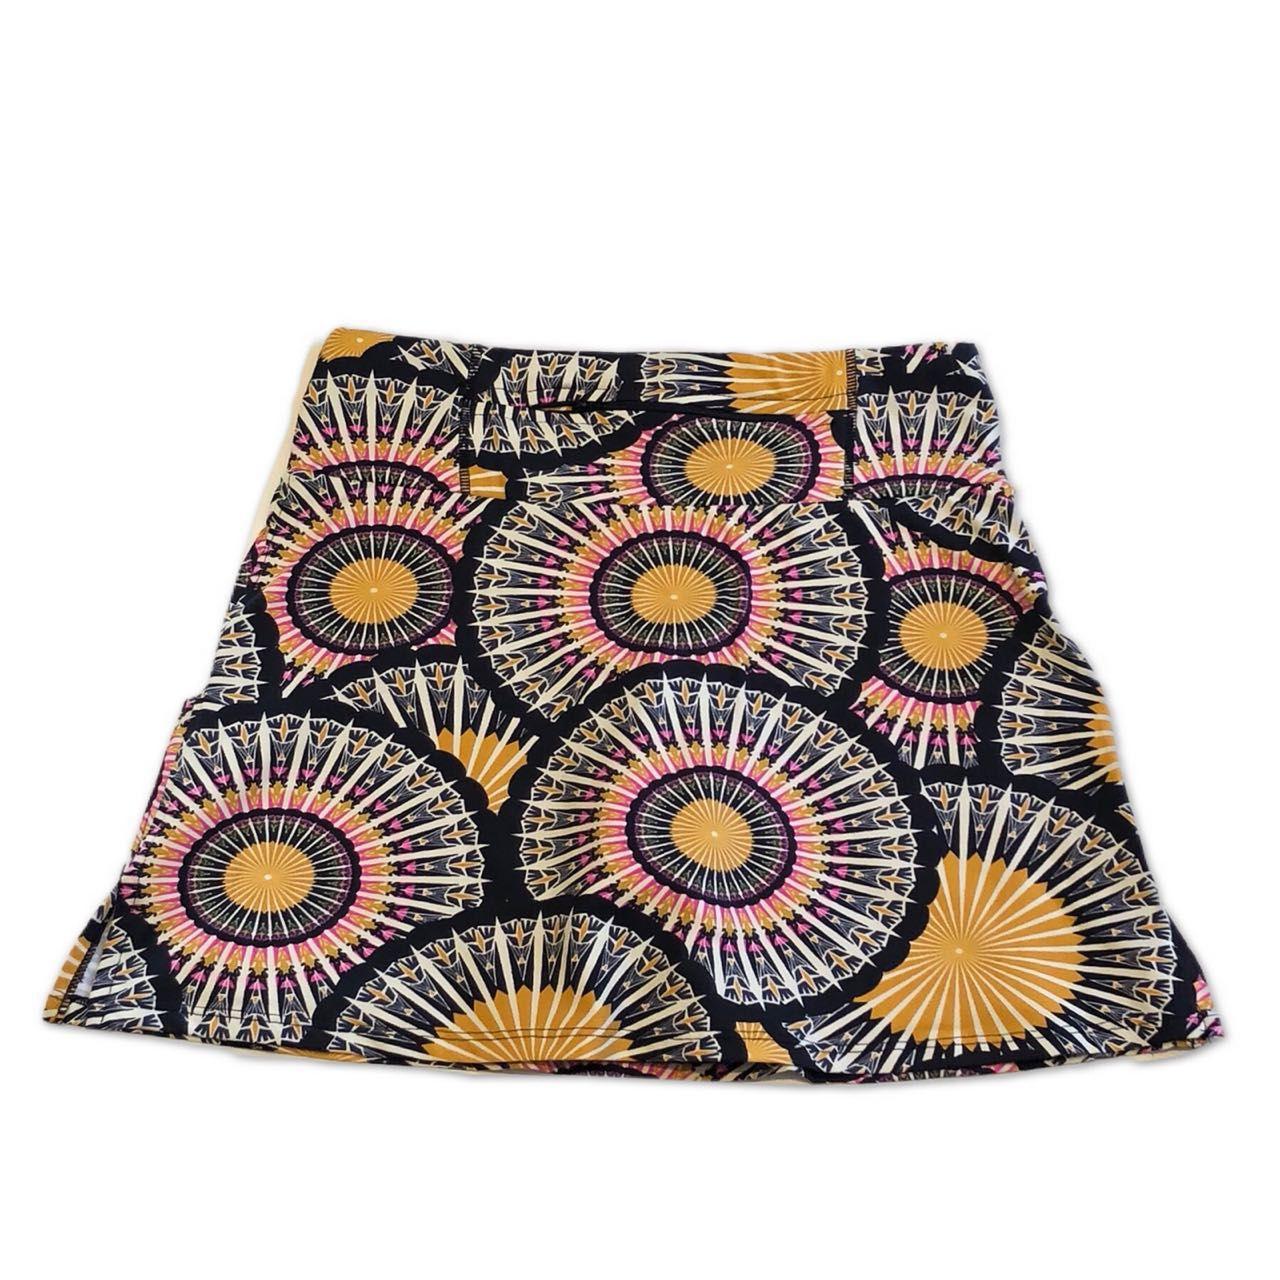 Saia Fitness 1500 bolsos estampa Mandala